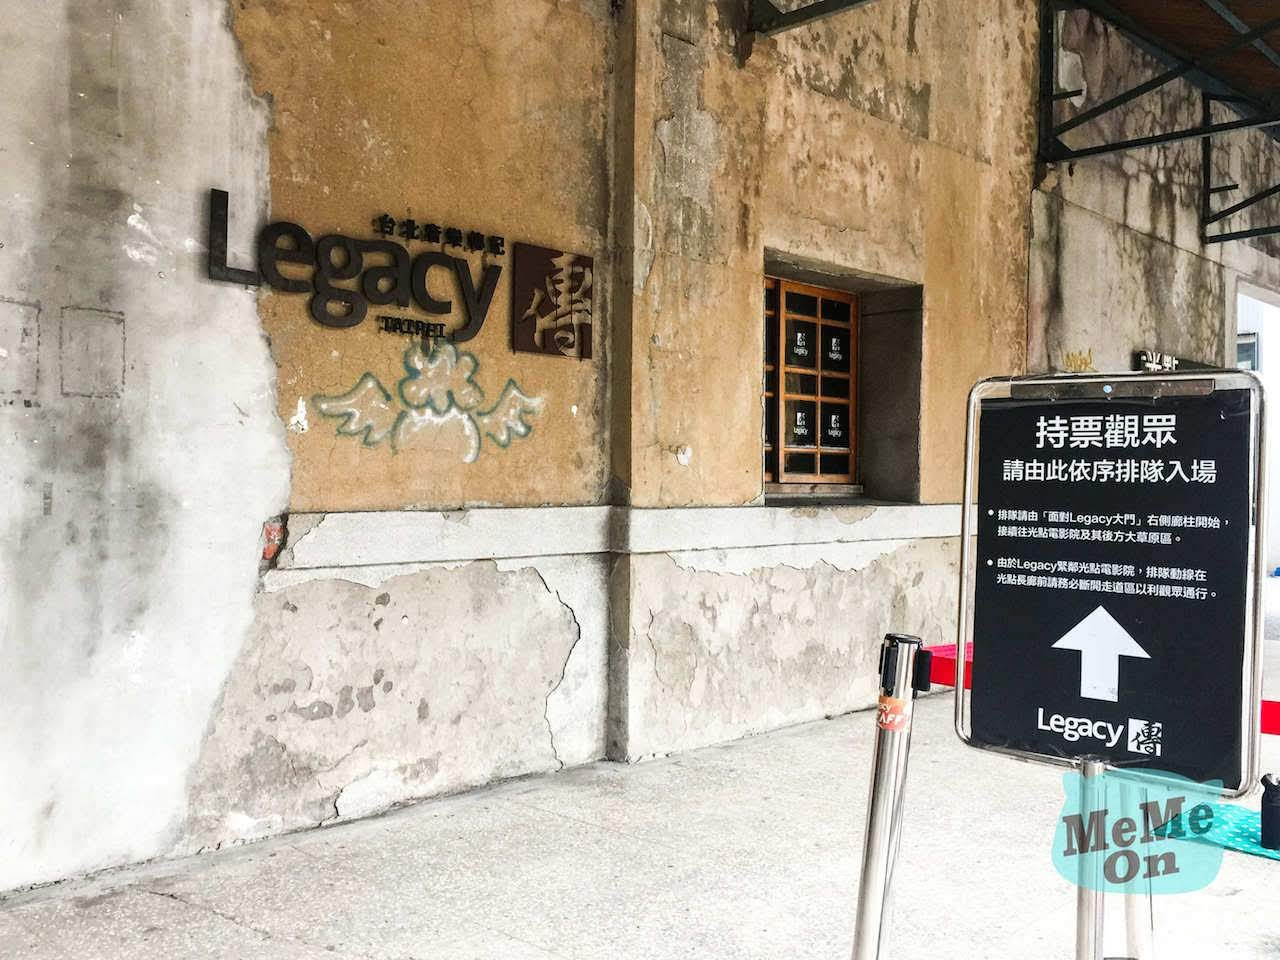 Legacy Taipei 容納人數/交通/寄物櫃/排隊動線 會場解說